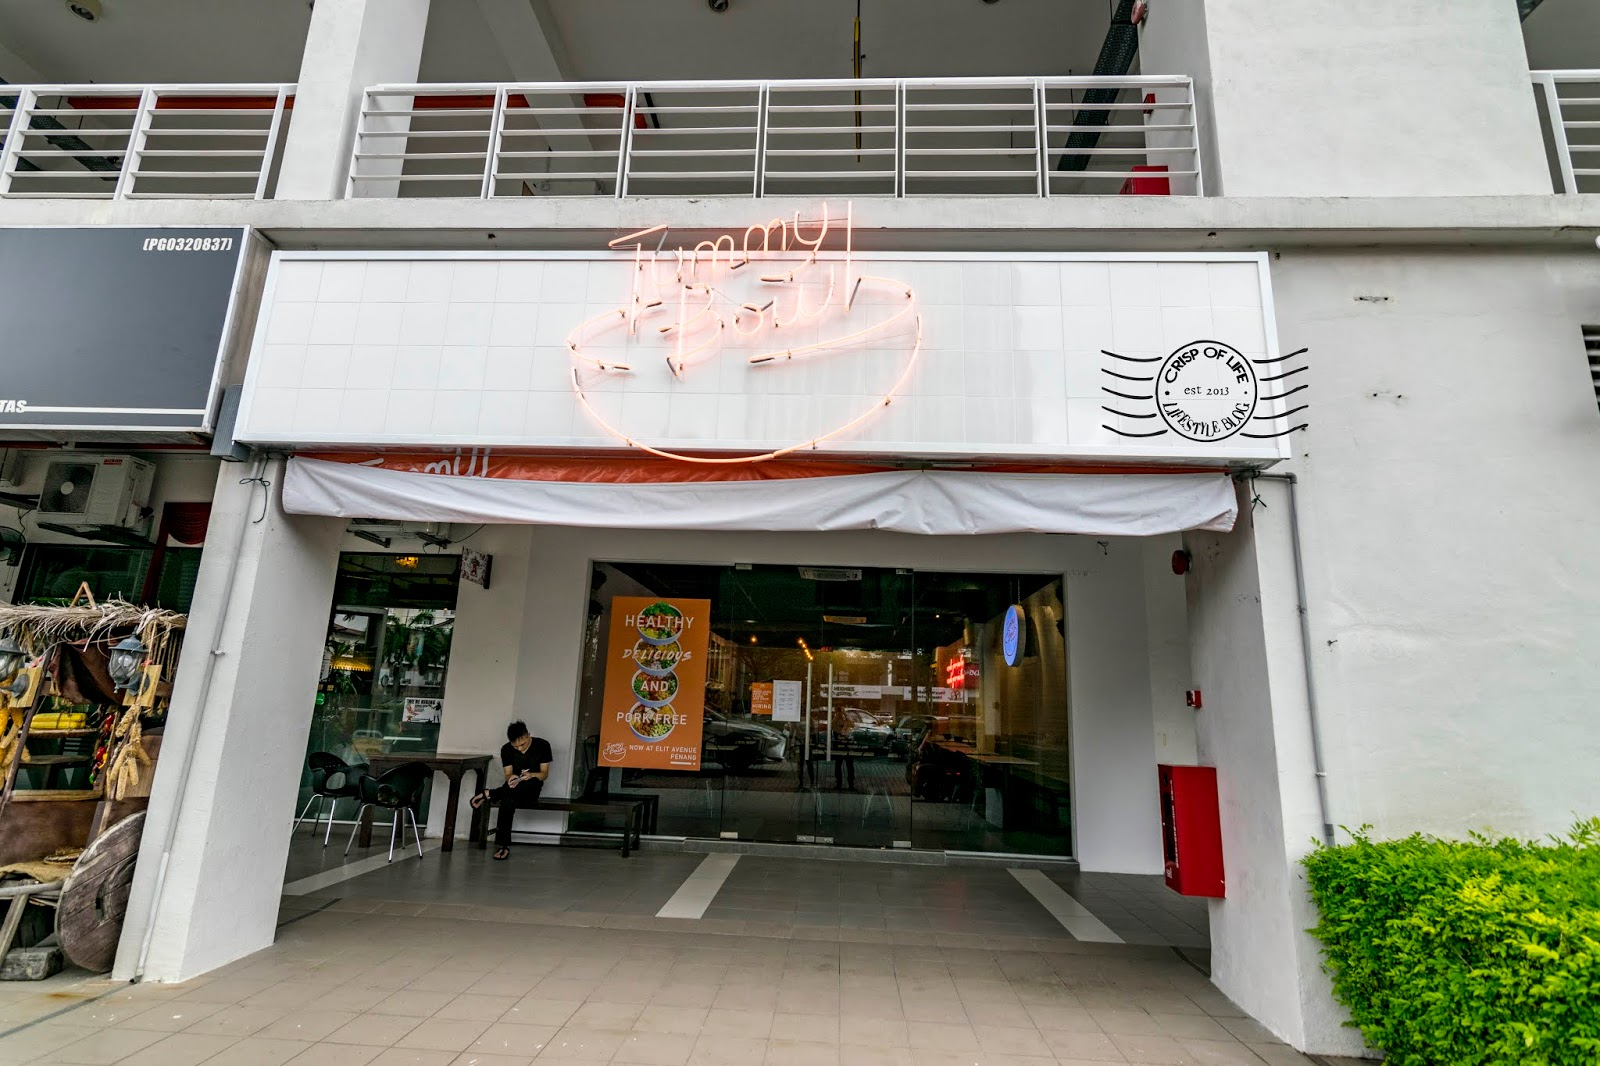 Tummy Bowl  Poke bowl @ Elit Avenue, Bayan Lepas, Penang